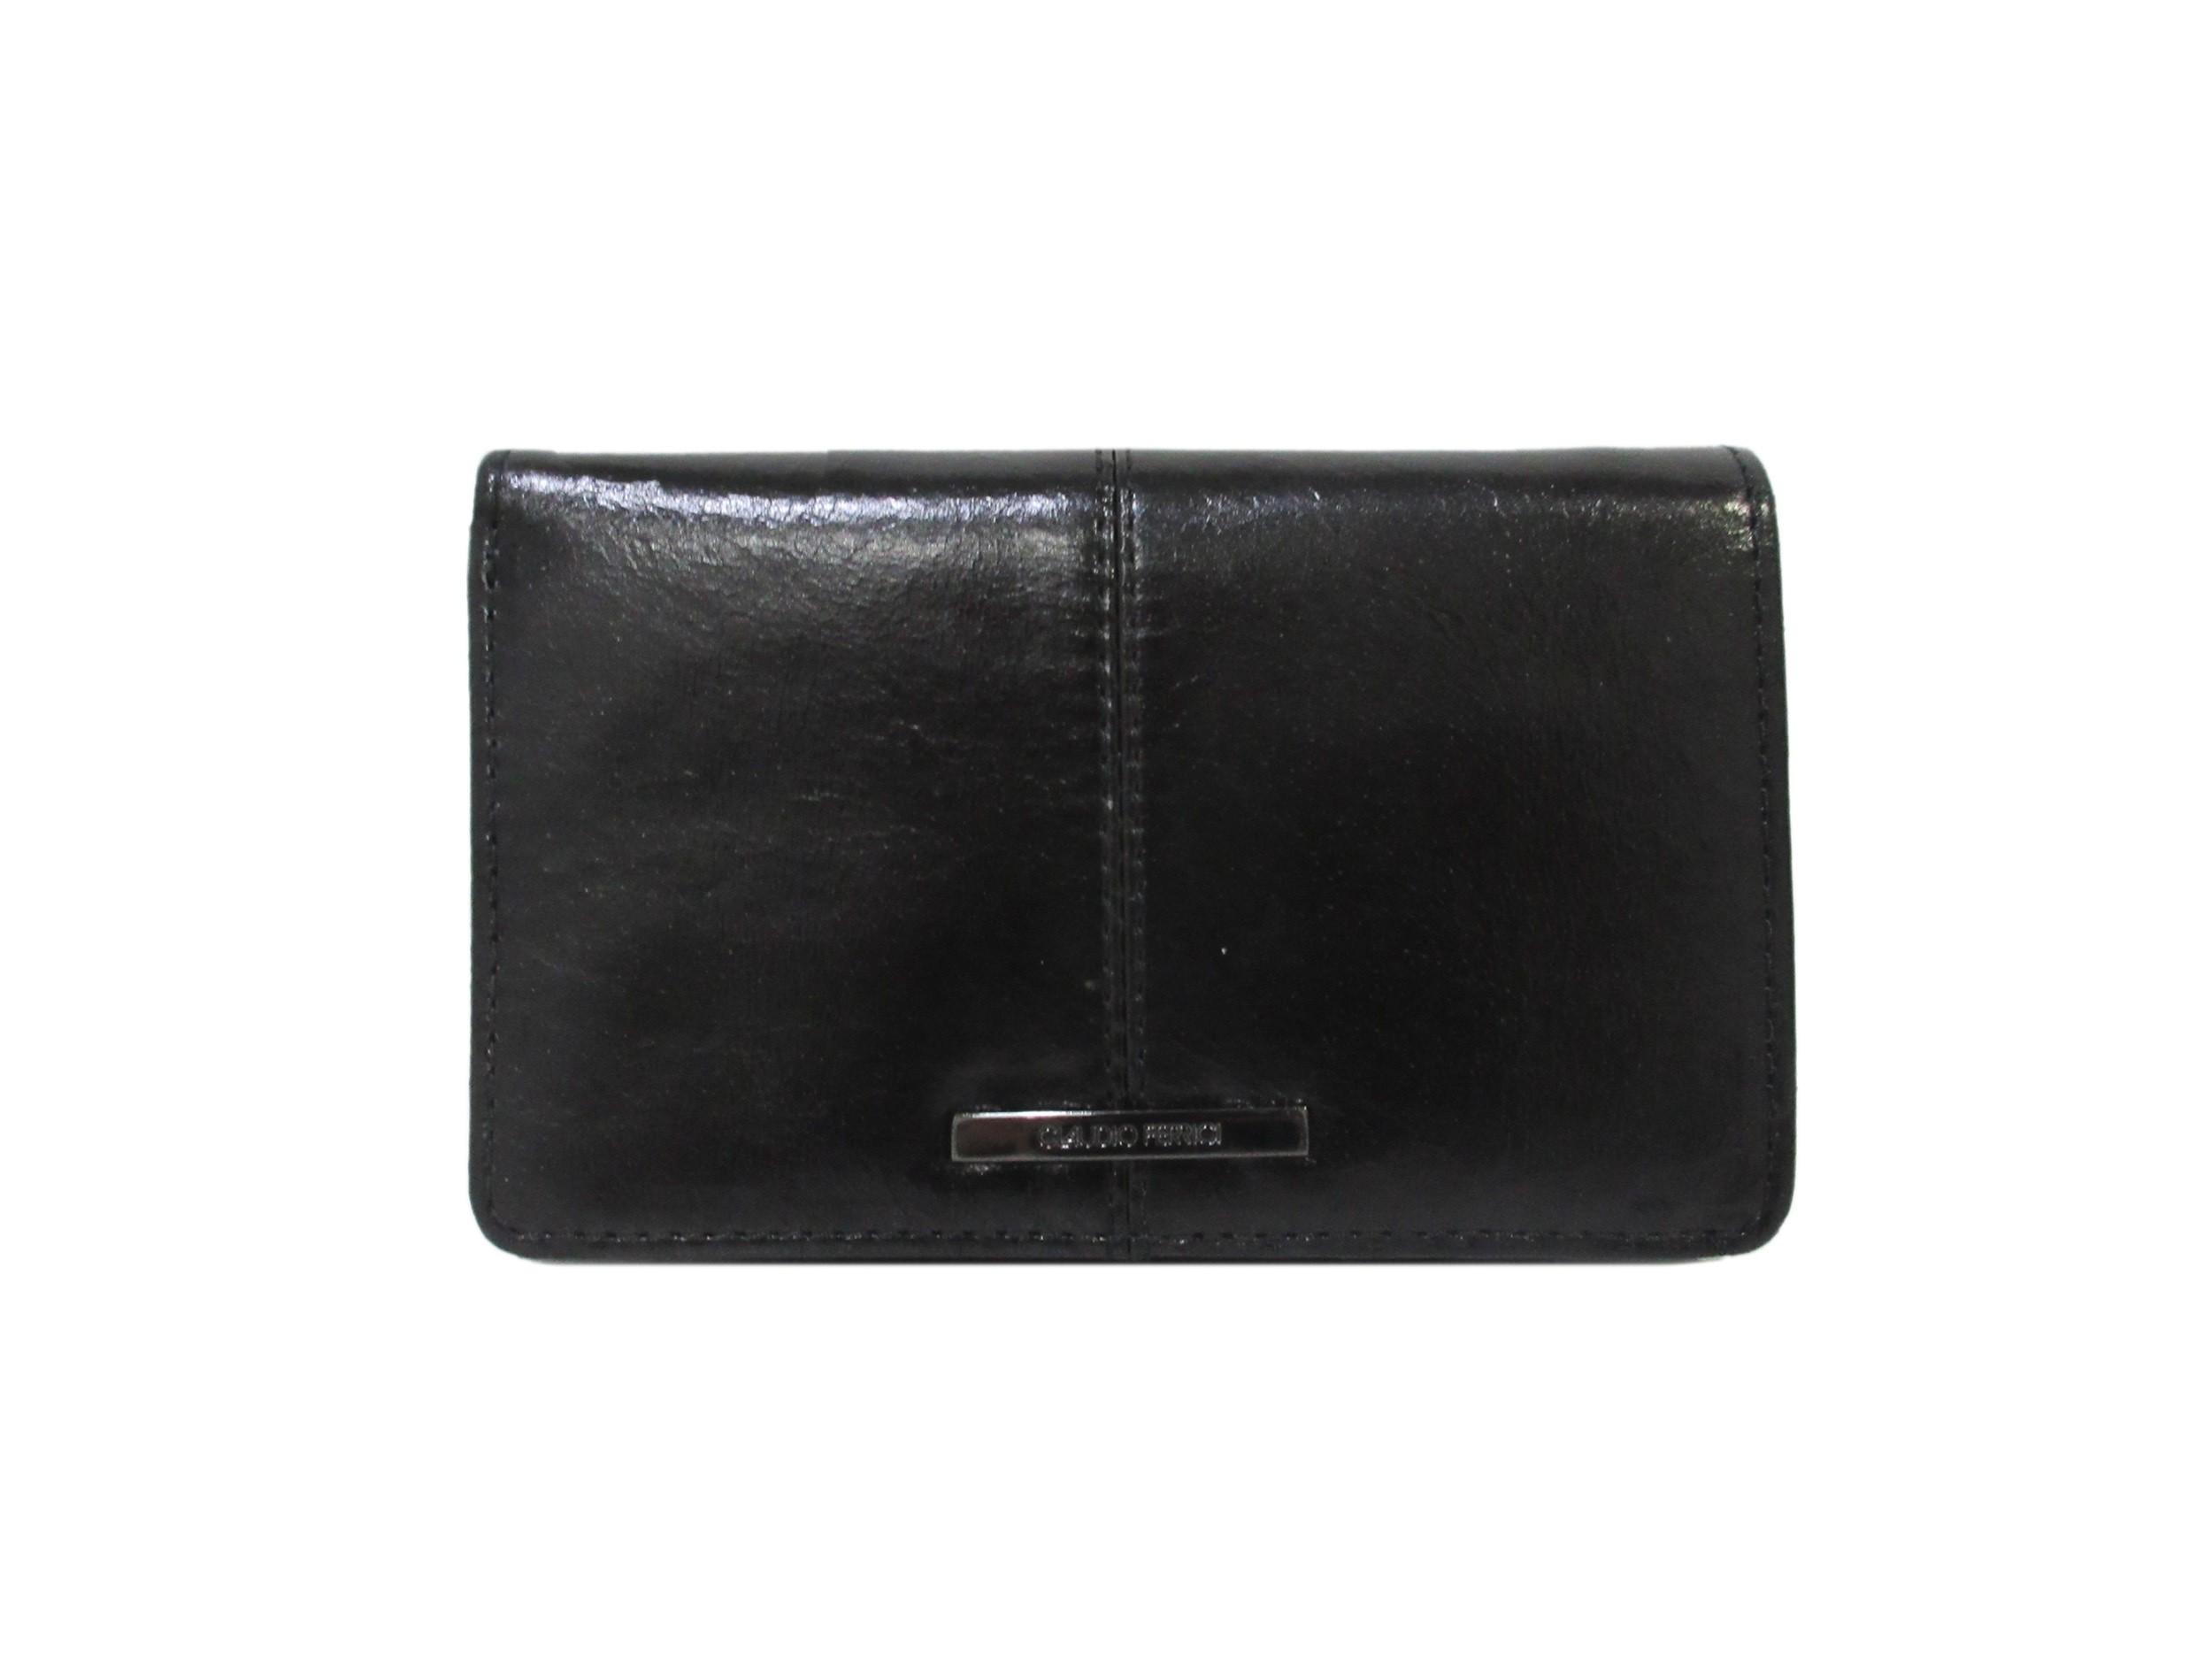 Claudio Ferrici Pelle Vecchia Wallet 22902 Black